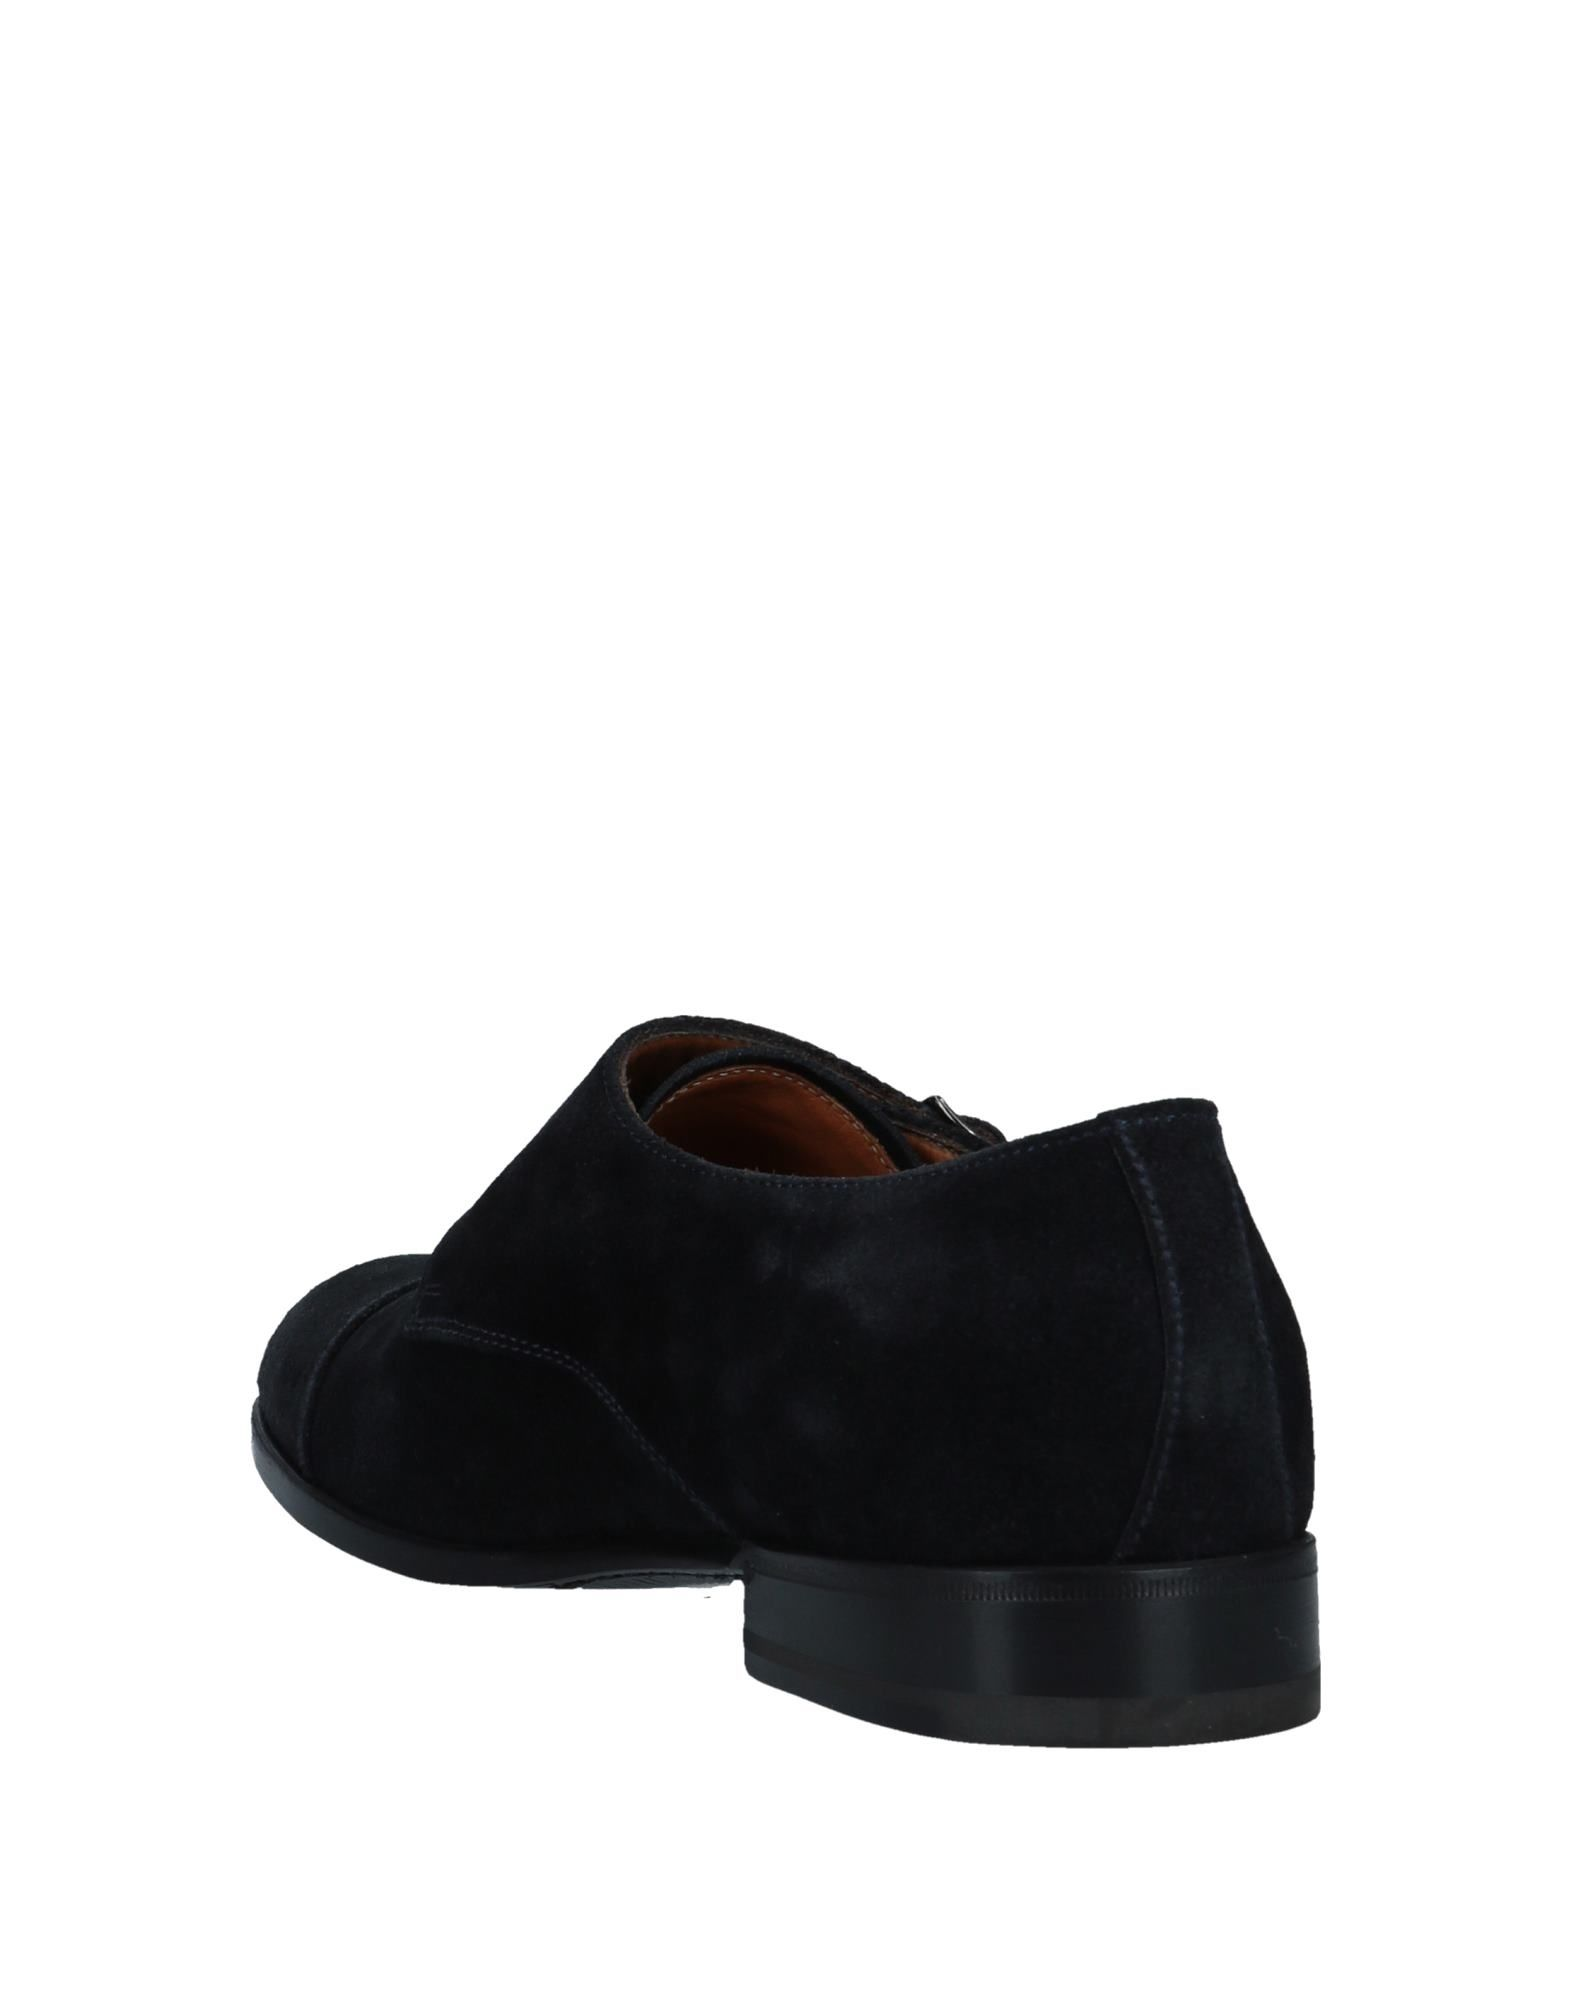 Barrett Mokassins Qualität Herren  11554627TK Gute Qualität Mokassins beliebte Schuhe acc757